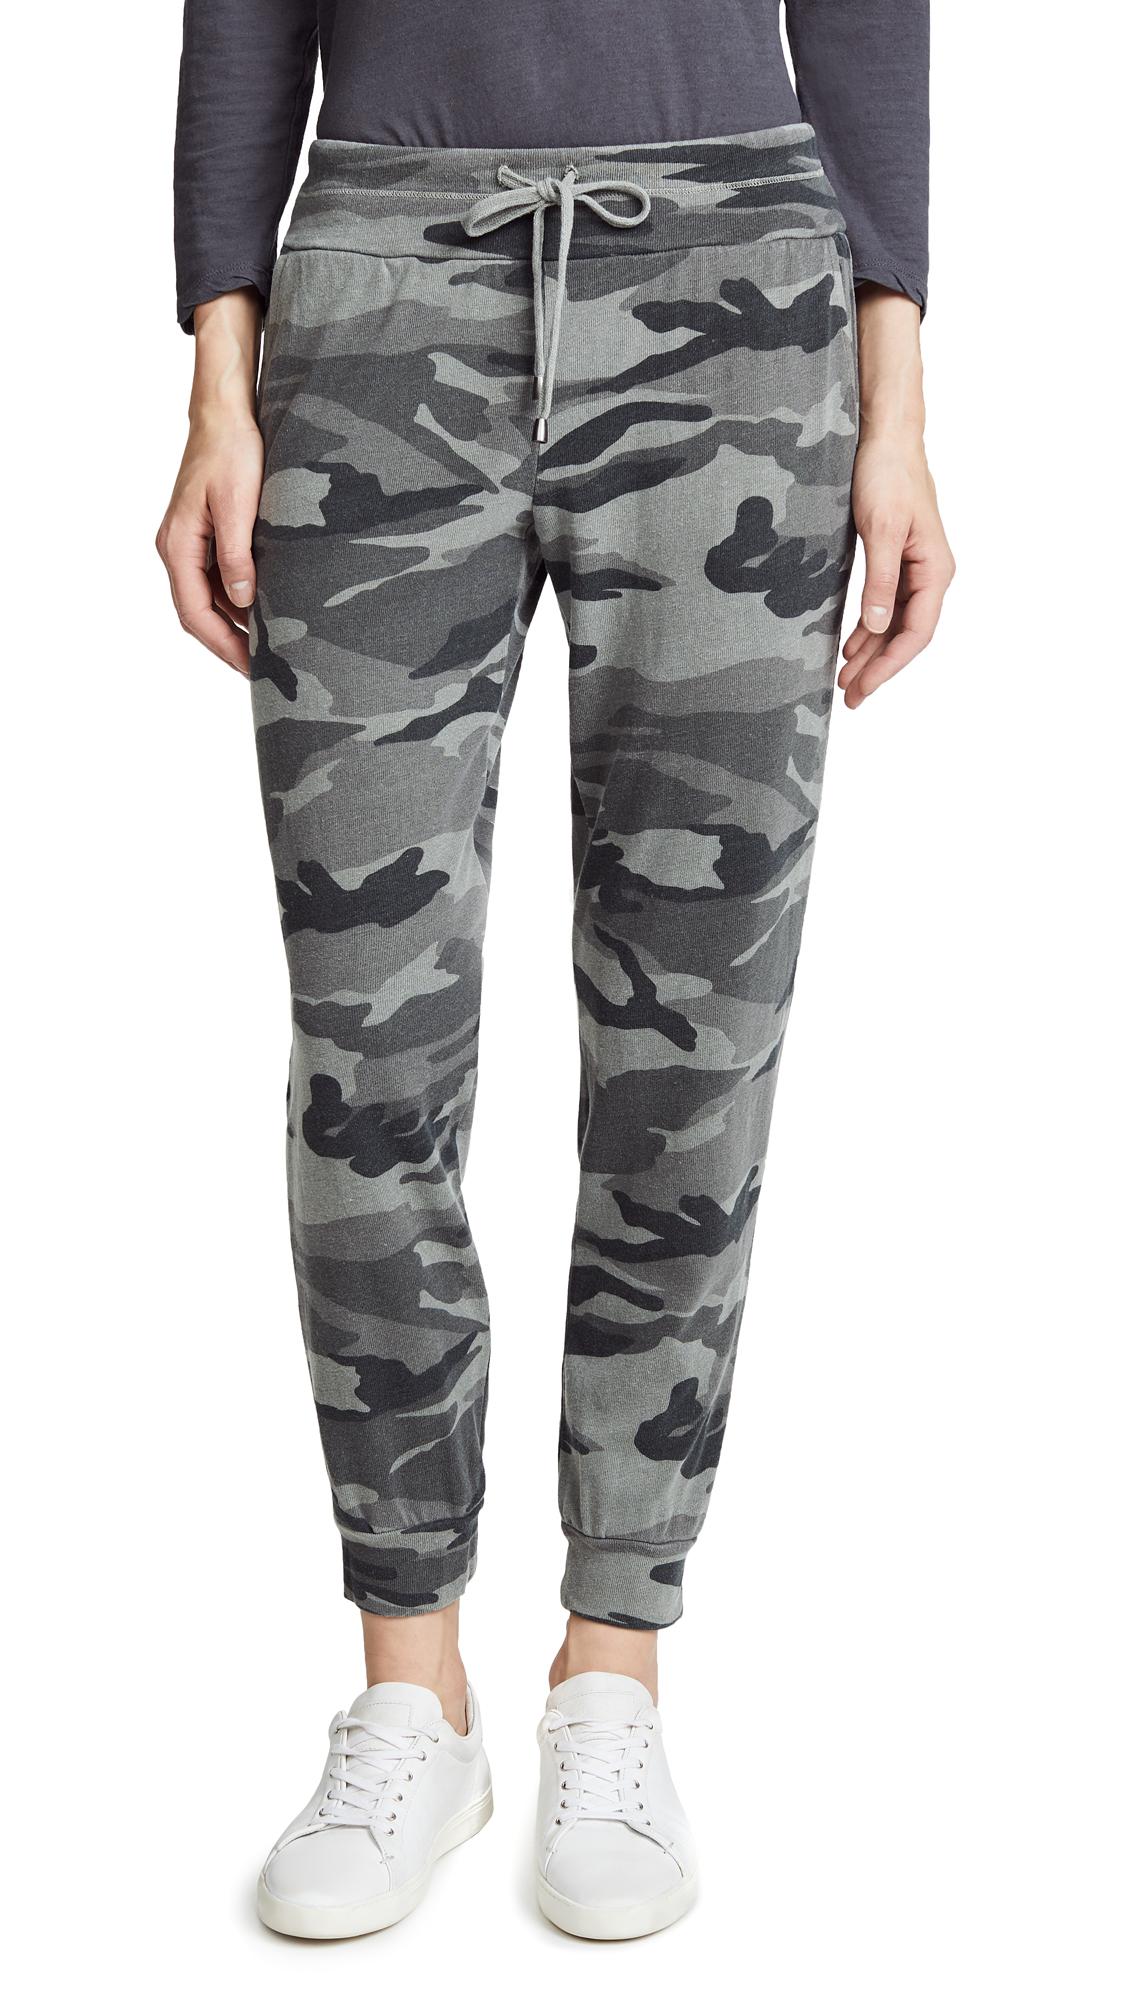 Splendid Camo Active Jogging Pants - Military Olive